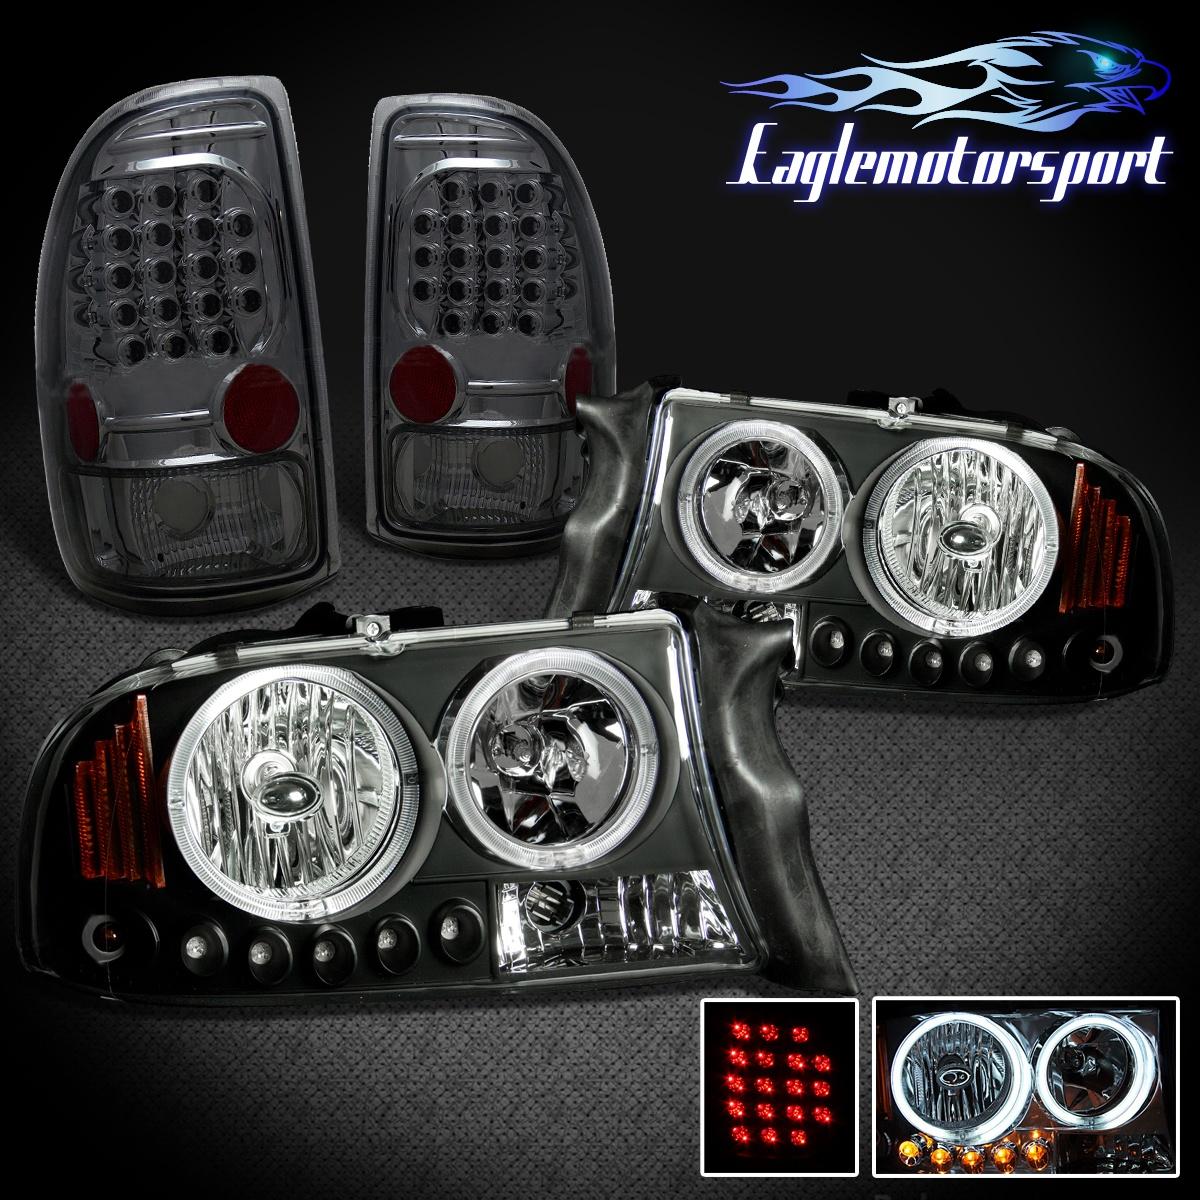 Ccfl Halo 1997 2004 Dodge Dakota Black Led Headlights Smoke Rear Brake Lights Wiring Diagram For 97 Dd97 Bc6a